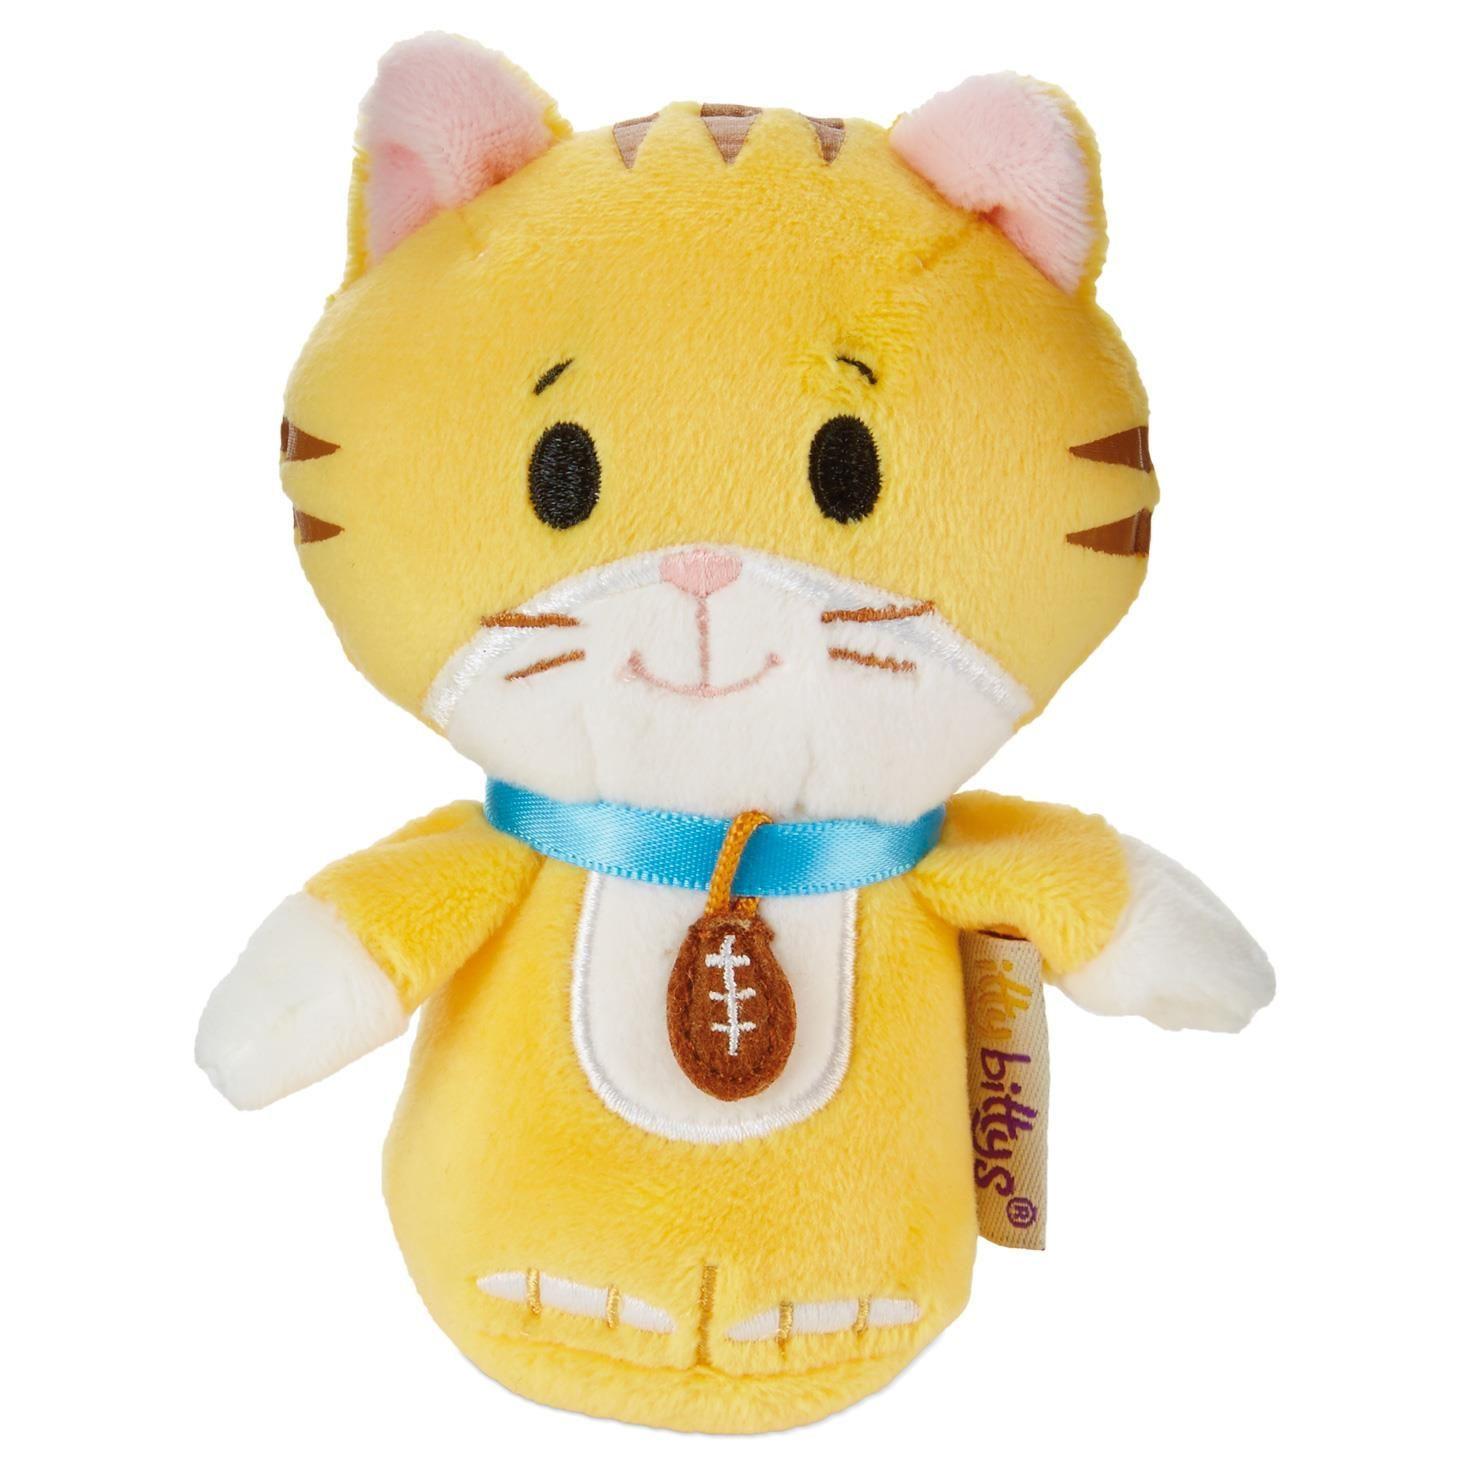 Itty Bittys Kitten Bowl Peanut Stuffed Animal Cats Kittens Cute Cats White Tabby Cat